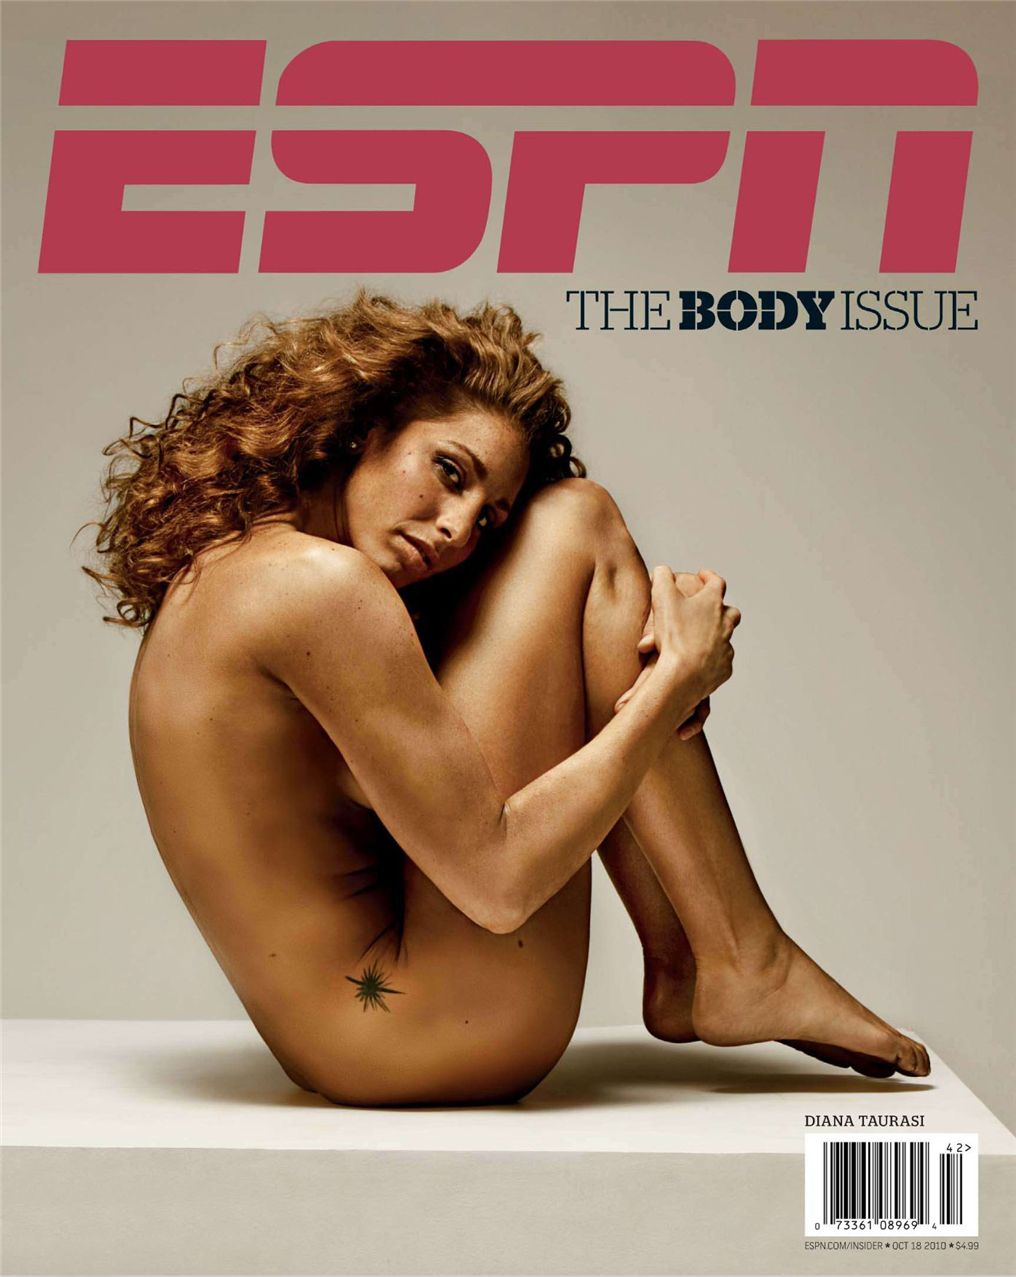 Дайана Таурази / Diana Taurasi - ESPN Magazine Body Issue 18 october 2010